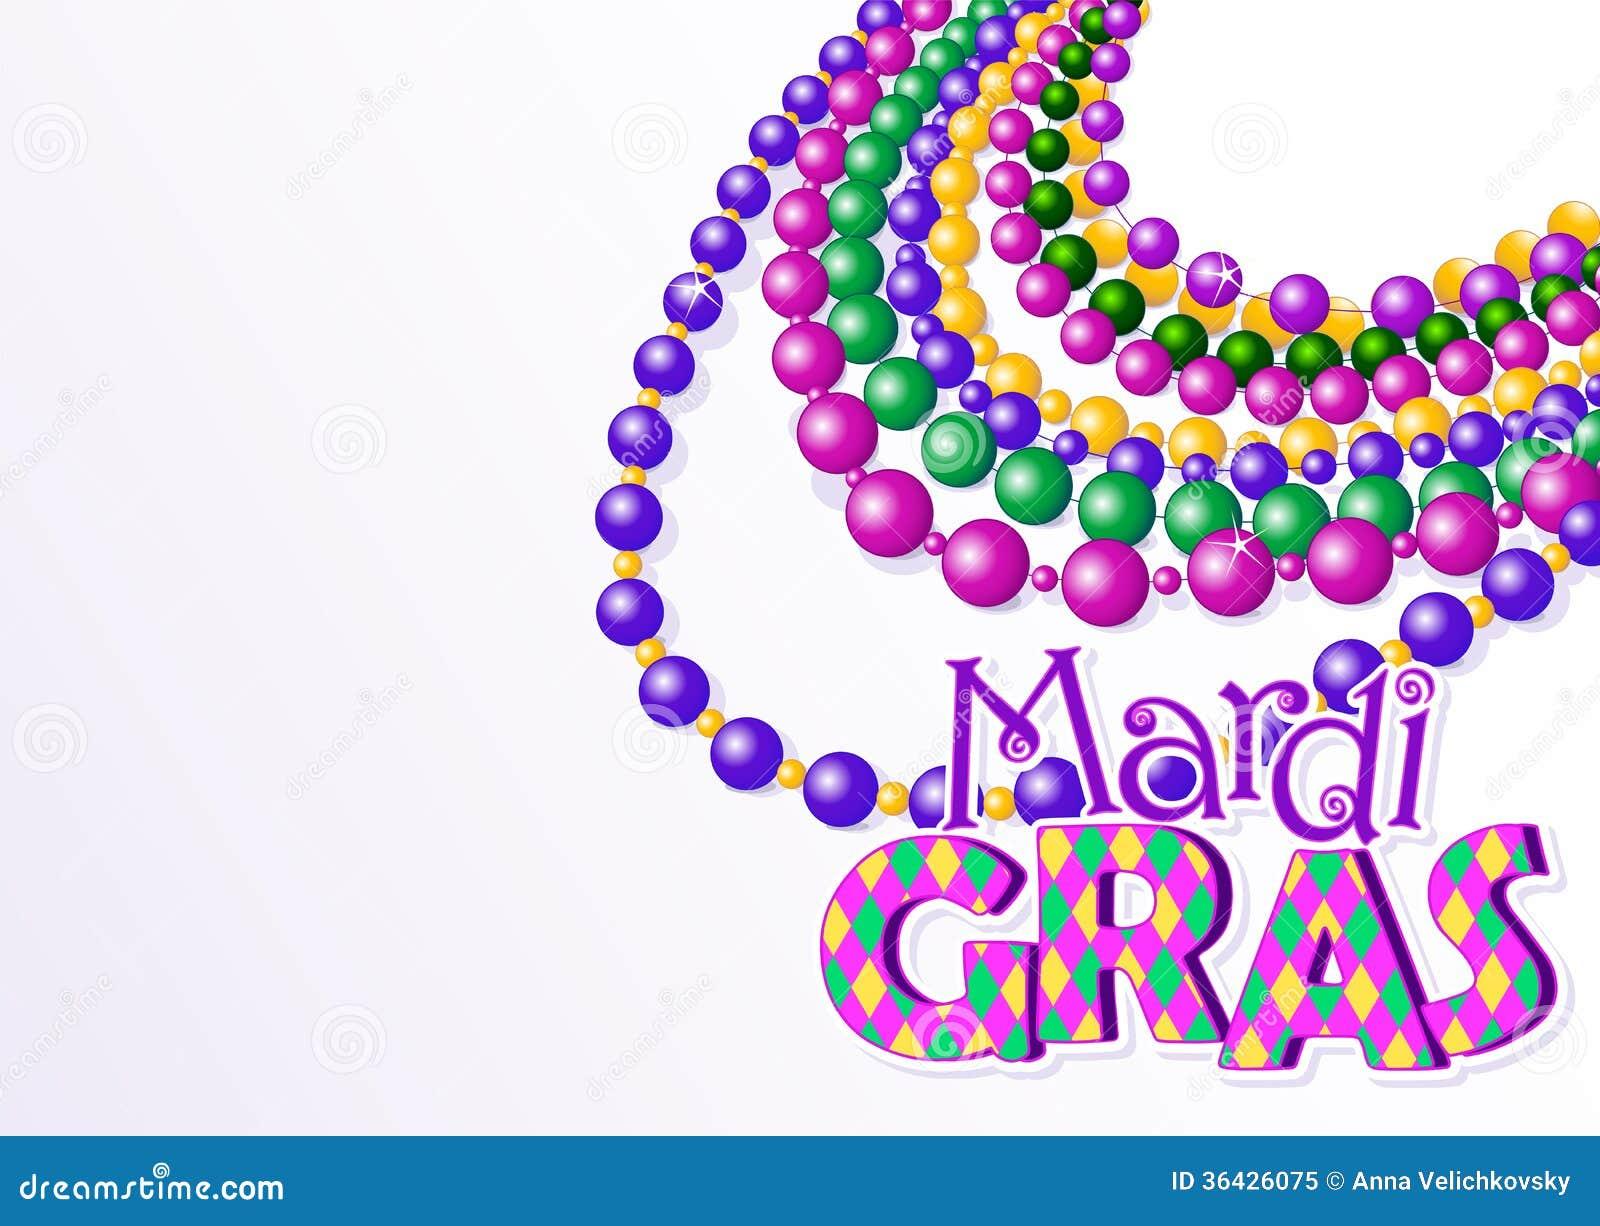 Mardi Gras Beads Clip Art Free Mardi gras beads background